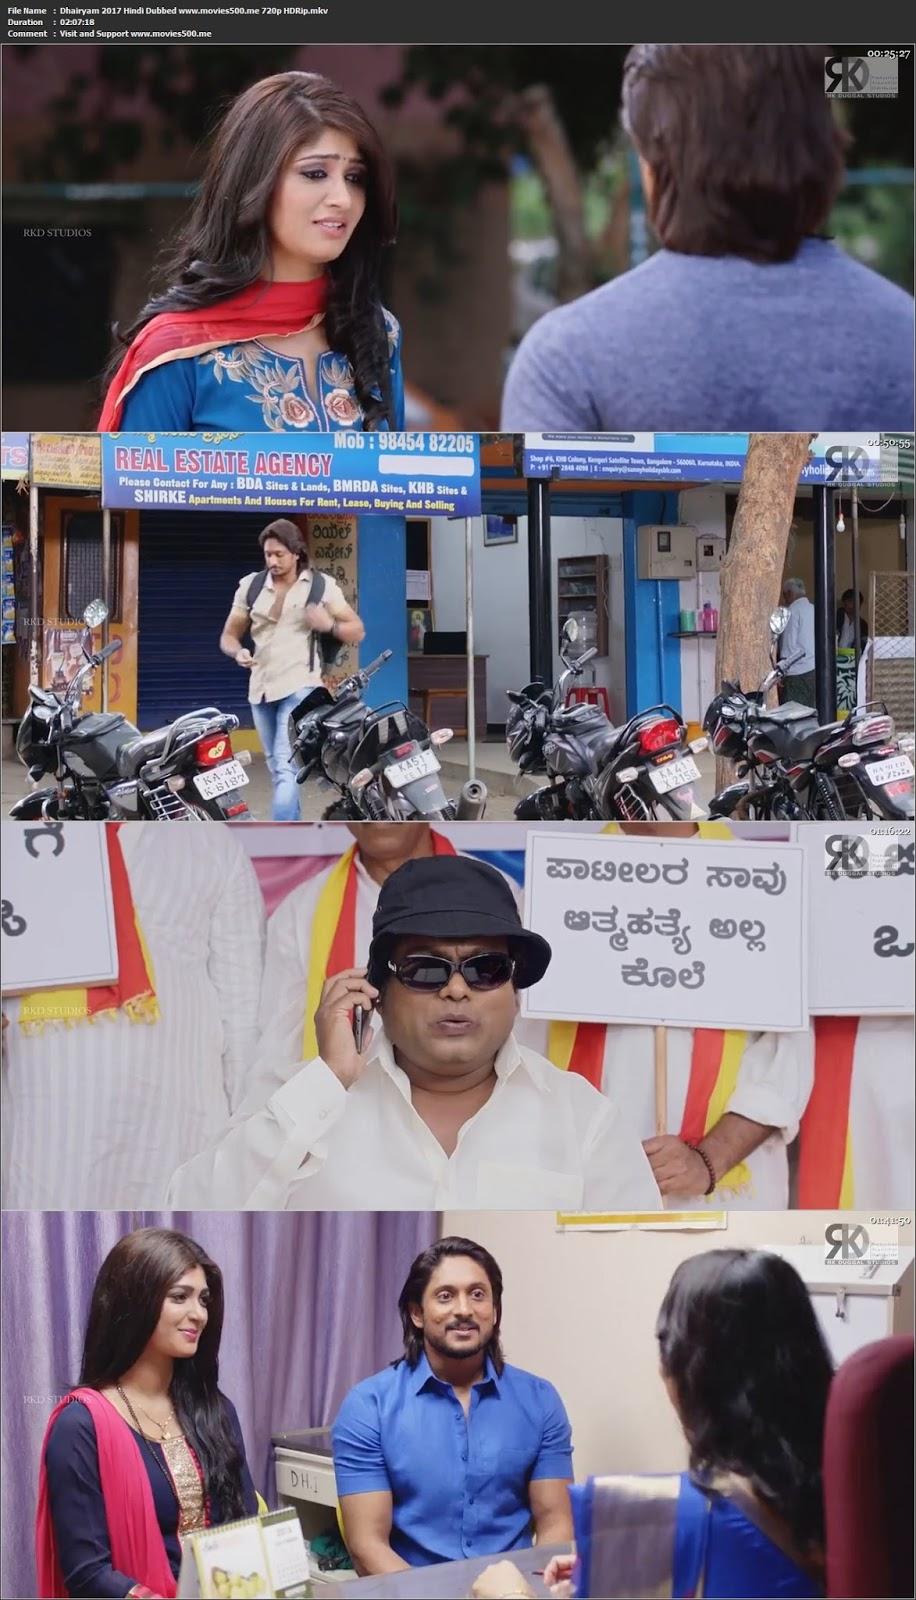 Dhairyam 2017 Hindi Dubbed Full Movie HDRip 720p at movies500.xyz